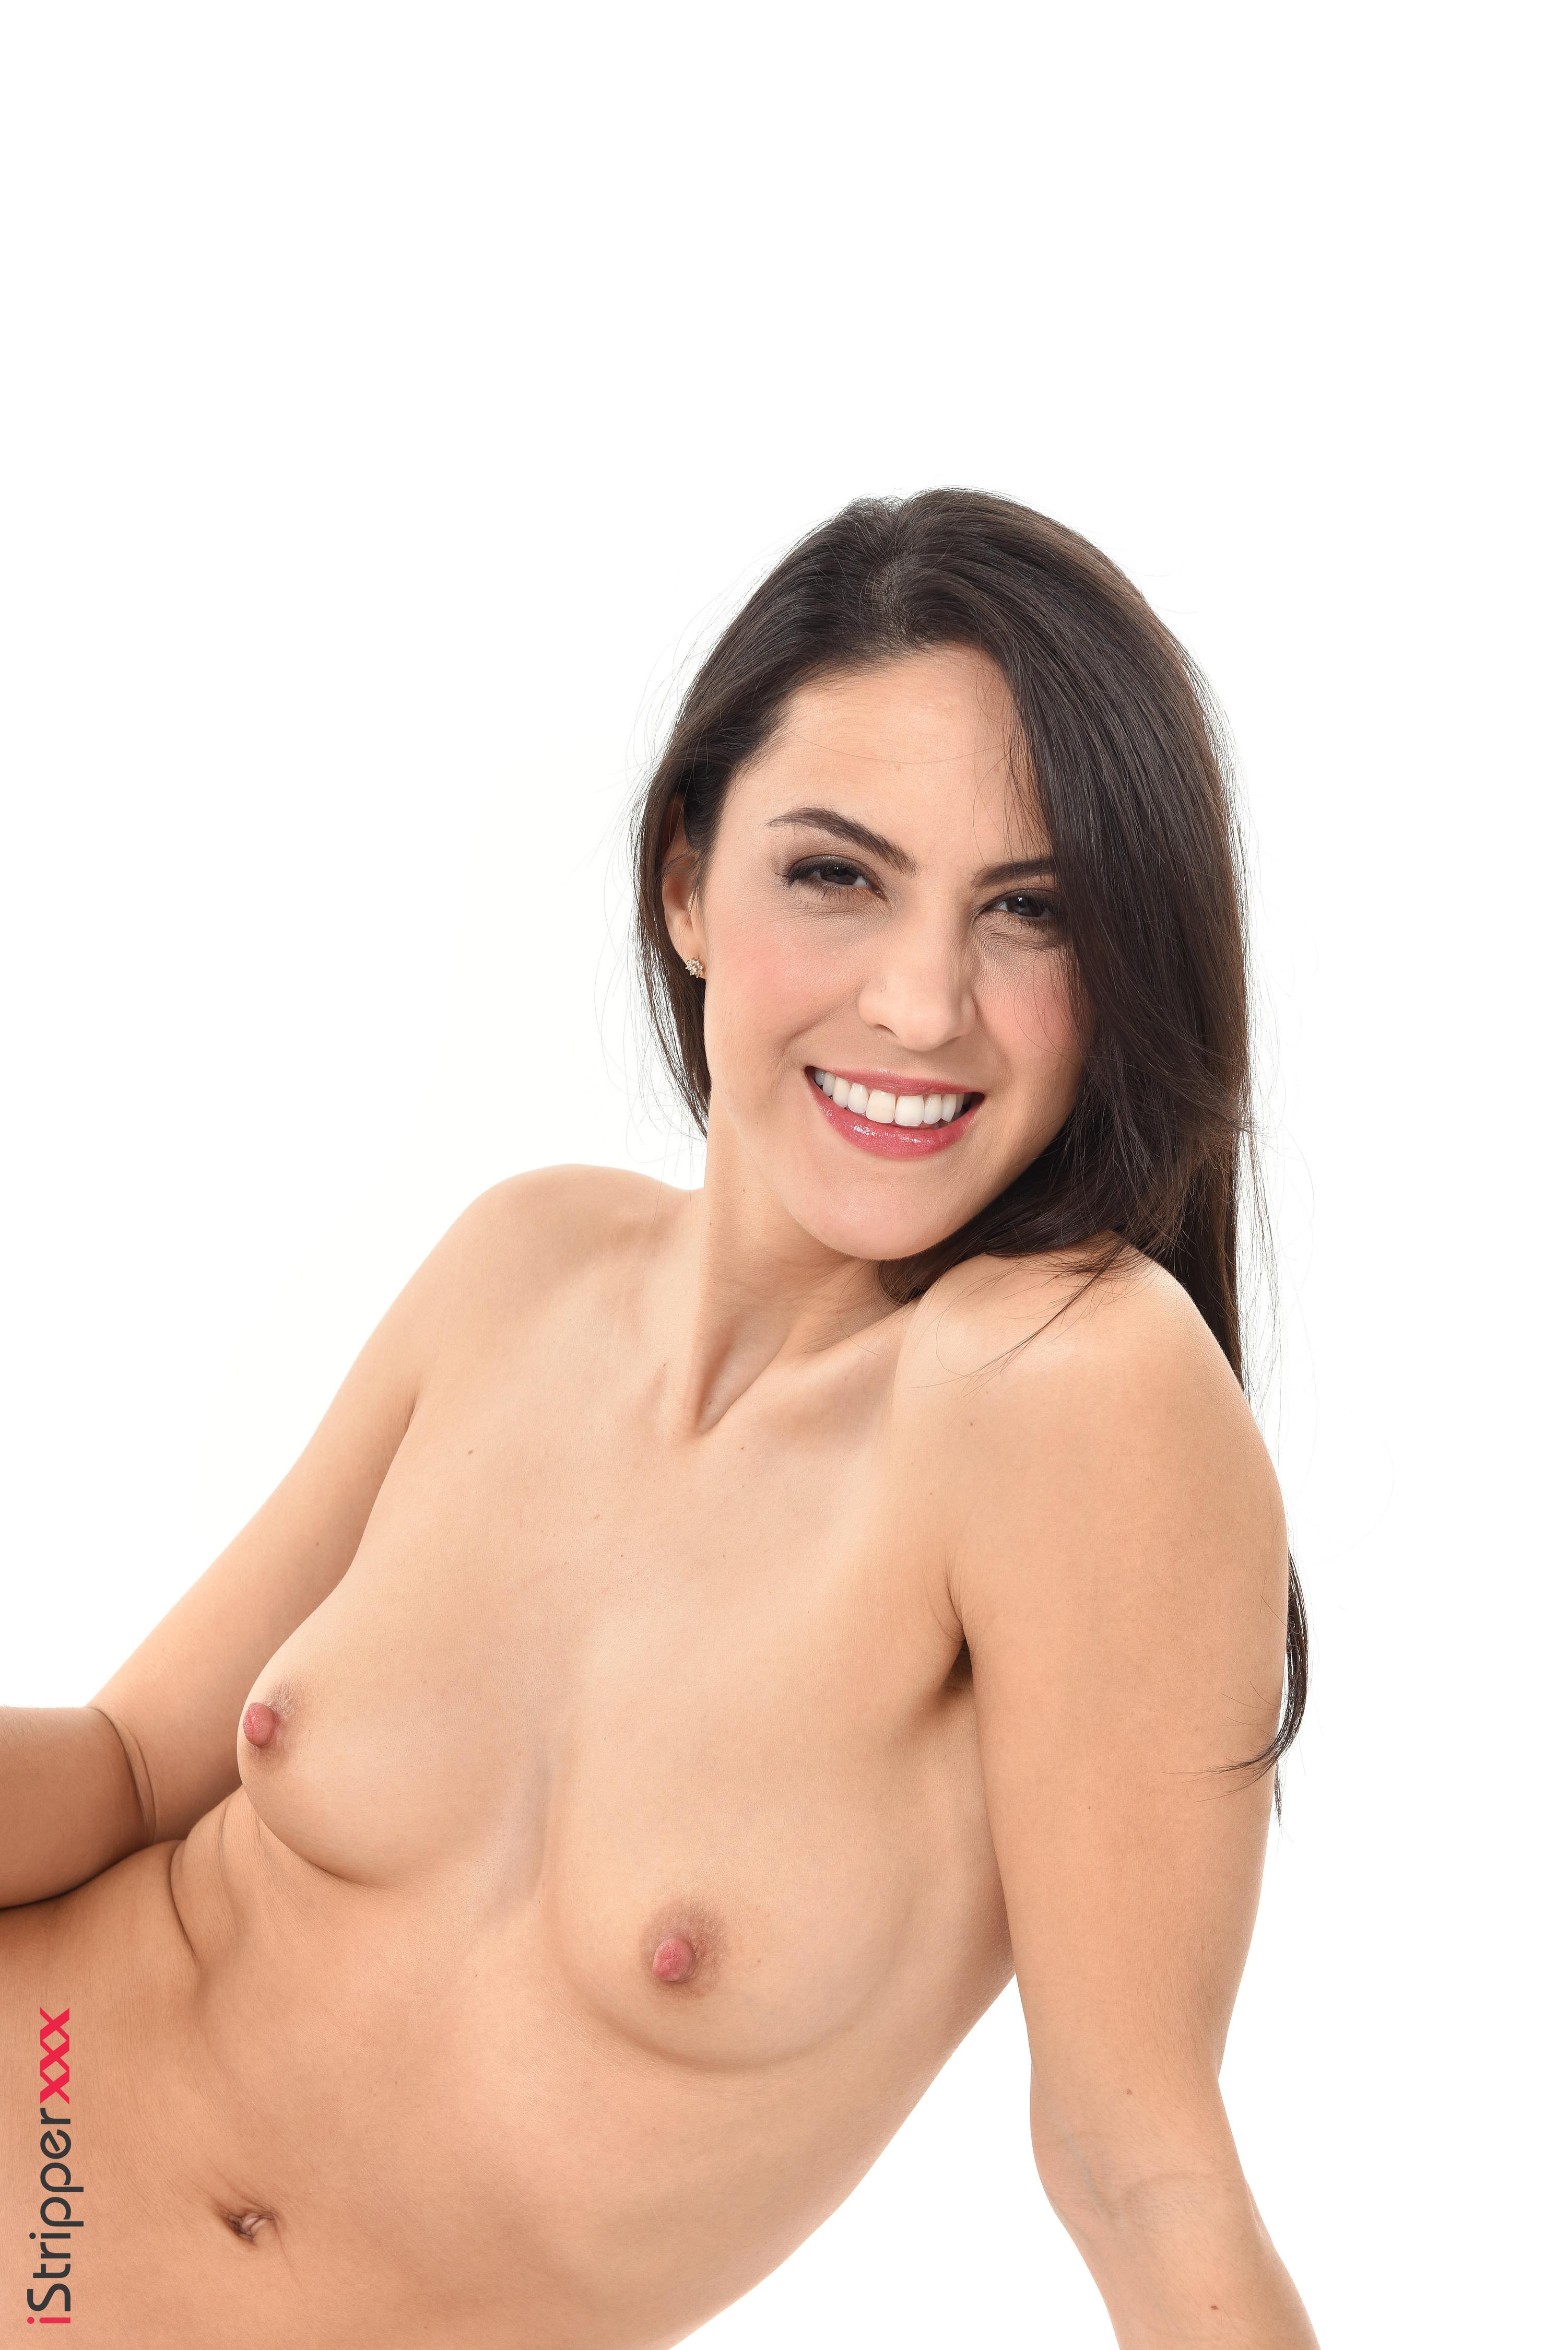 free sex wallpaper download